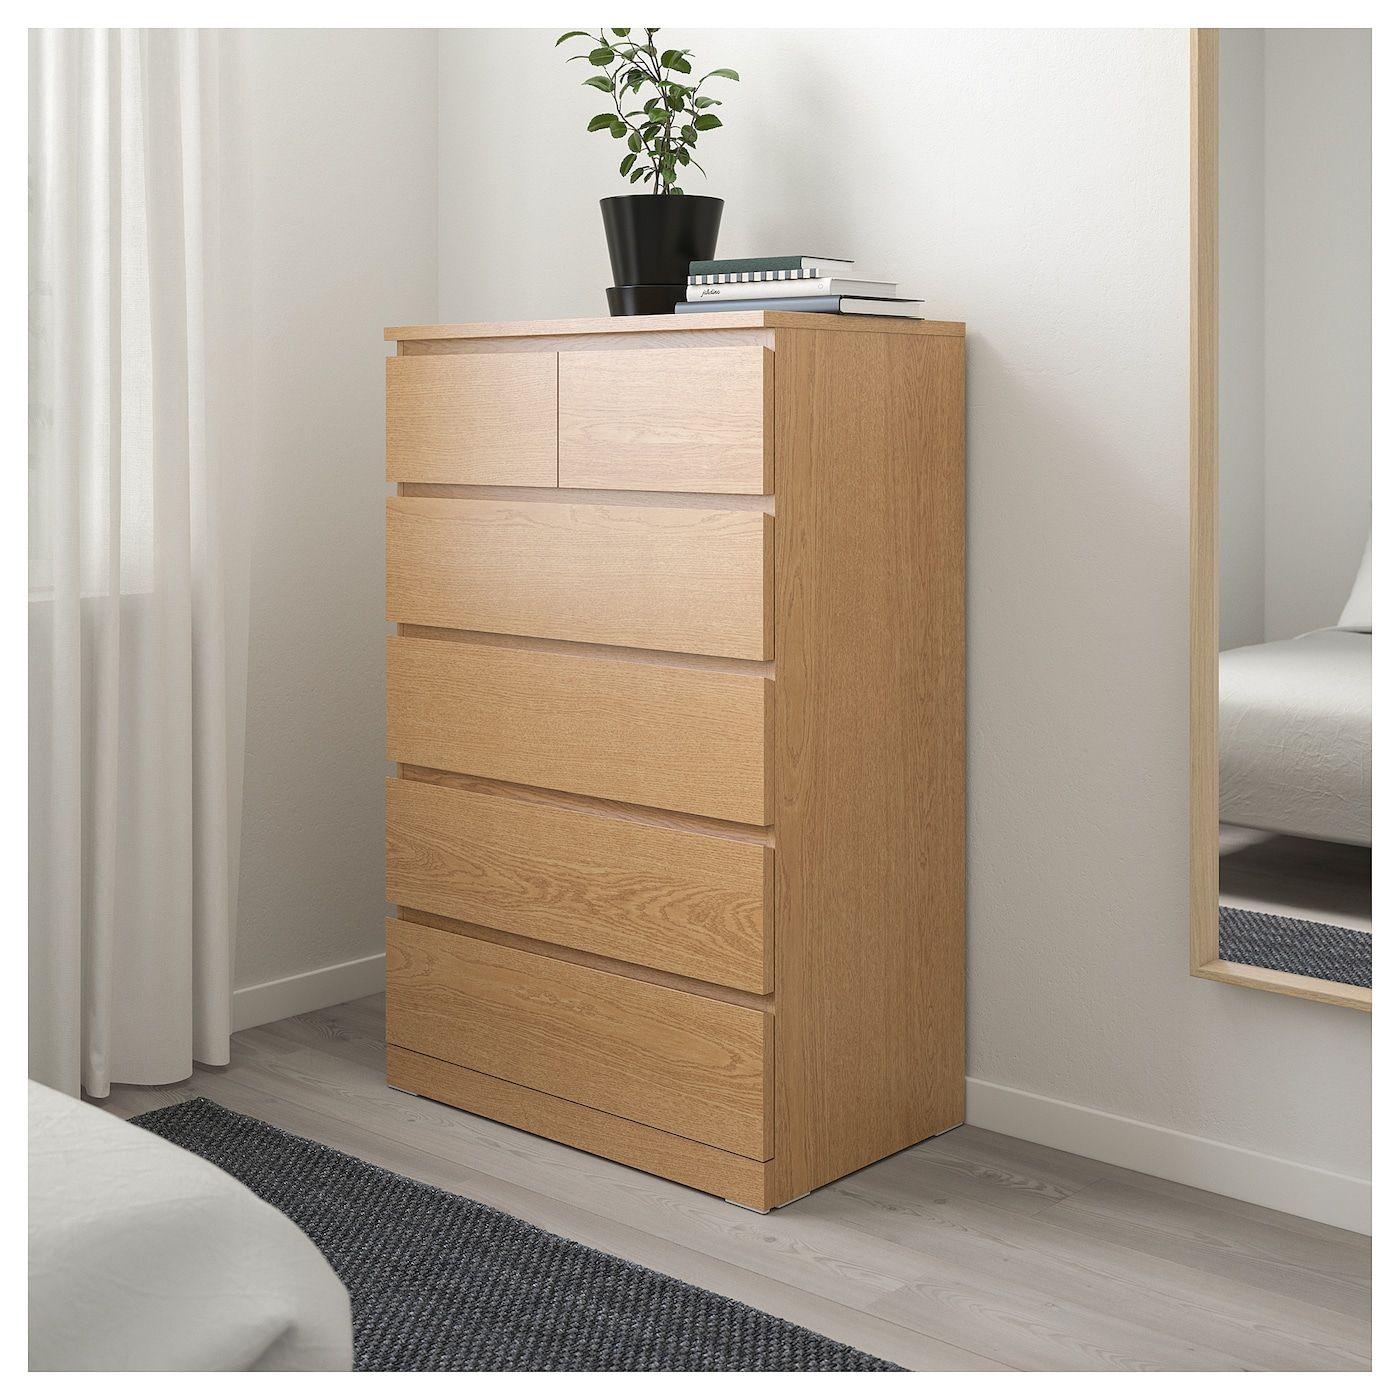 IKEA MALM Chest of 6 drawers | Malm